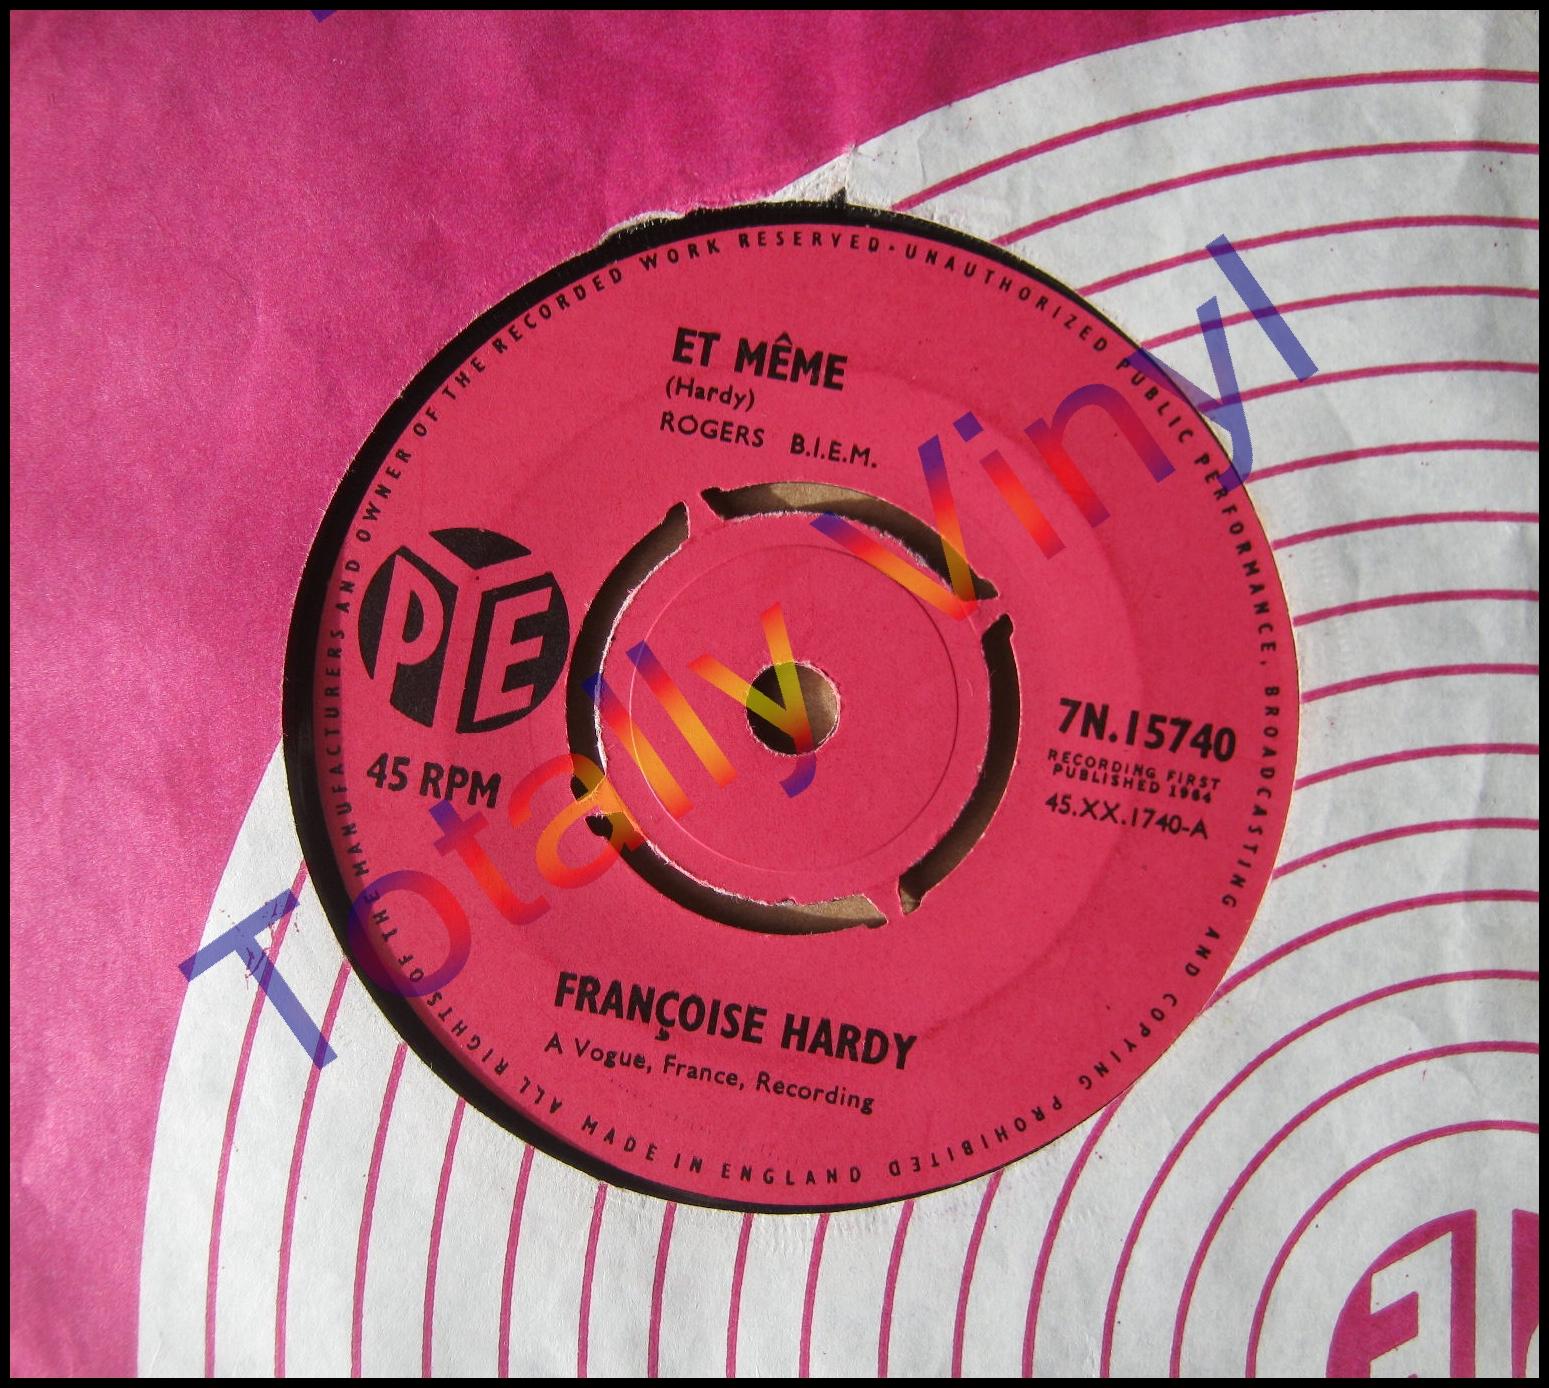 FRANCOISE_HARDY_ET_MEME_7 totally vinyl records hardy, francoise et meme le temps de,Et Meme Francoise Hardy